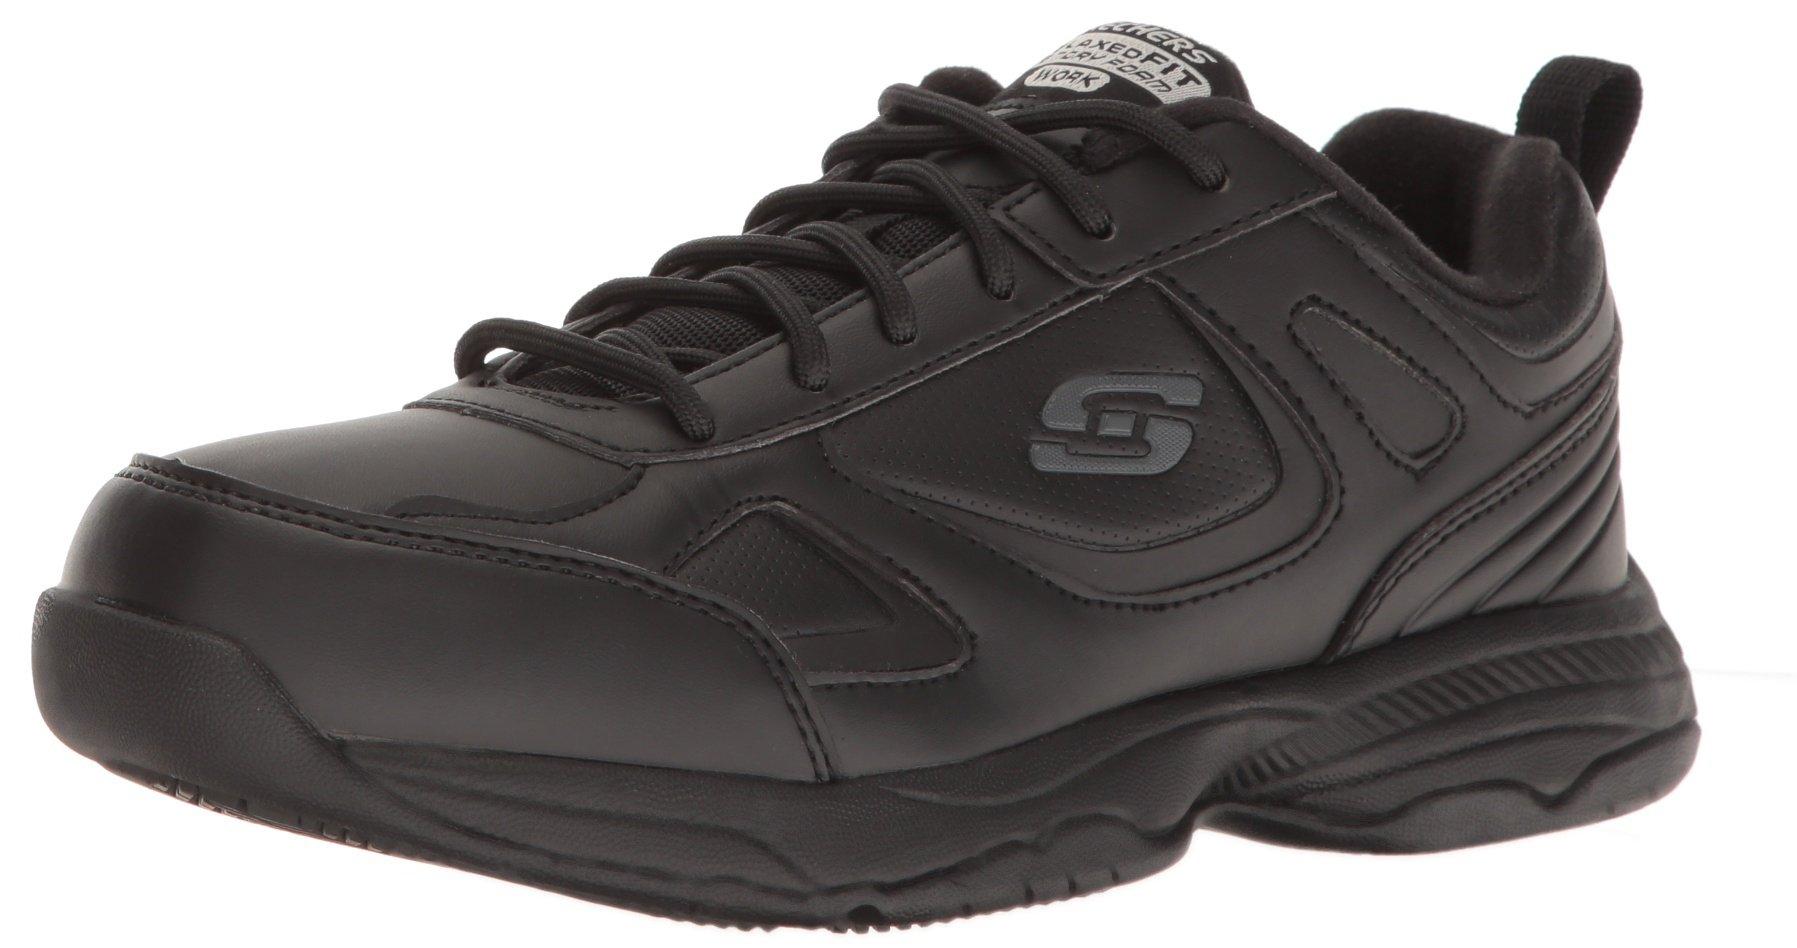 Skechers for Work Women's Dighton Bricelyn Work Shoe,Black,6 M US